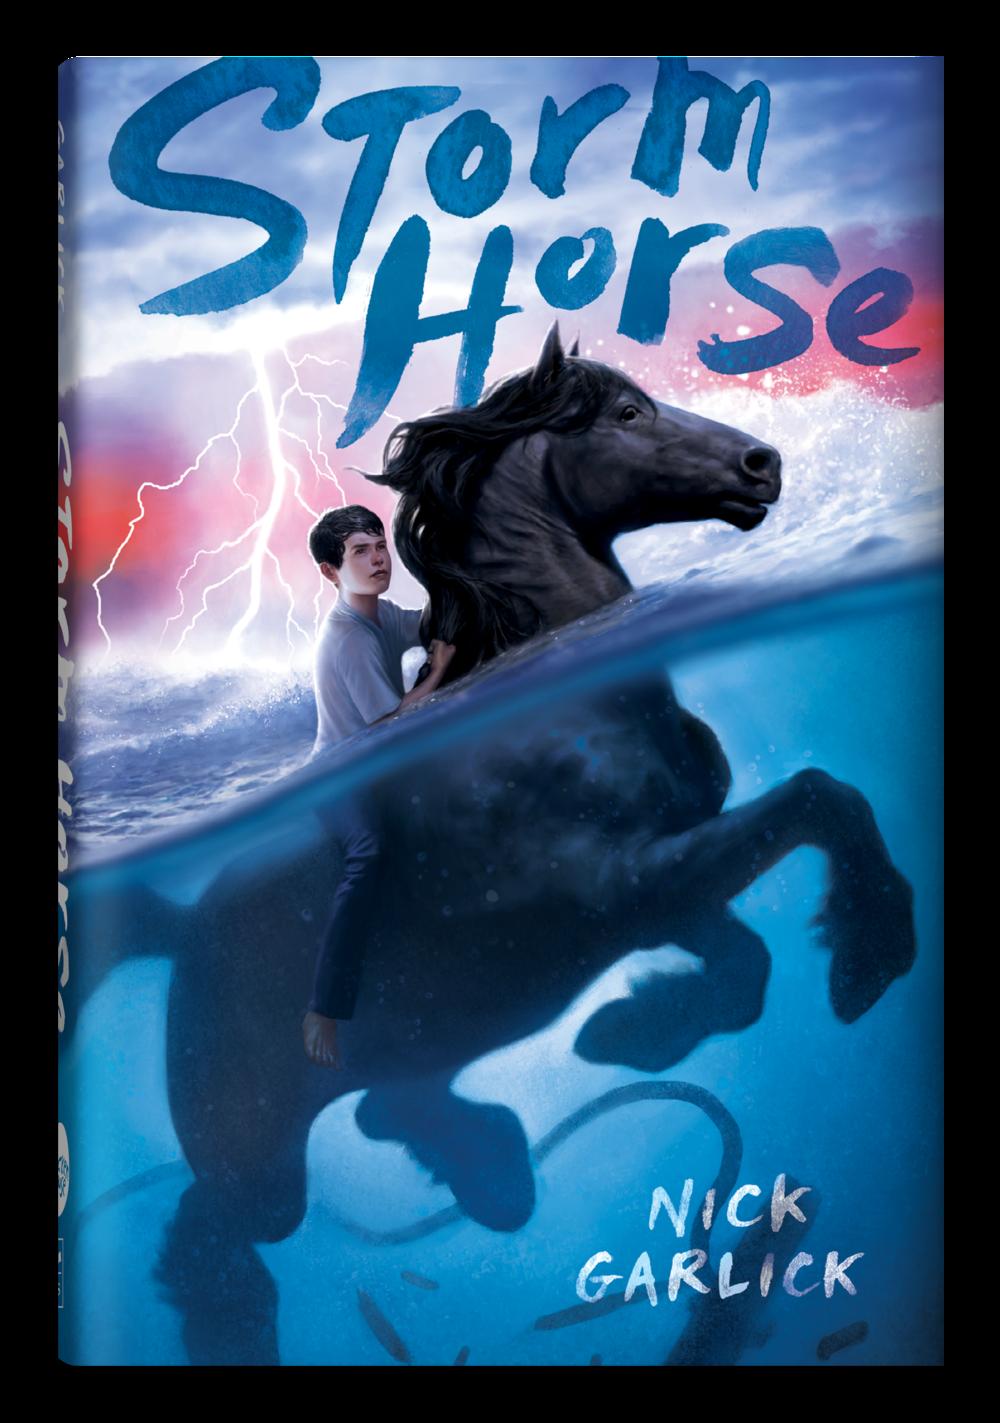 stormhorse_mockup_front.png